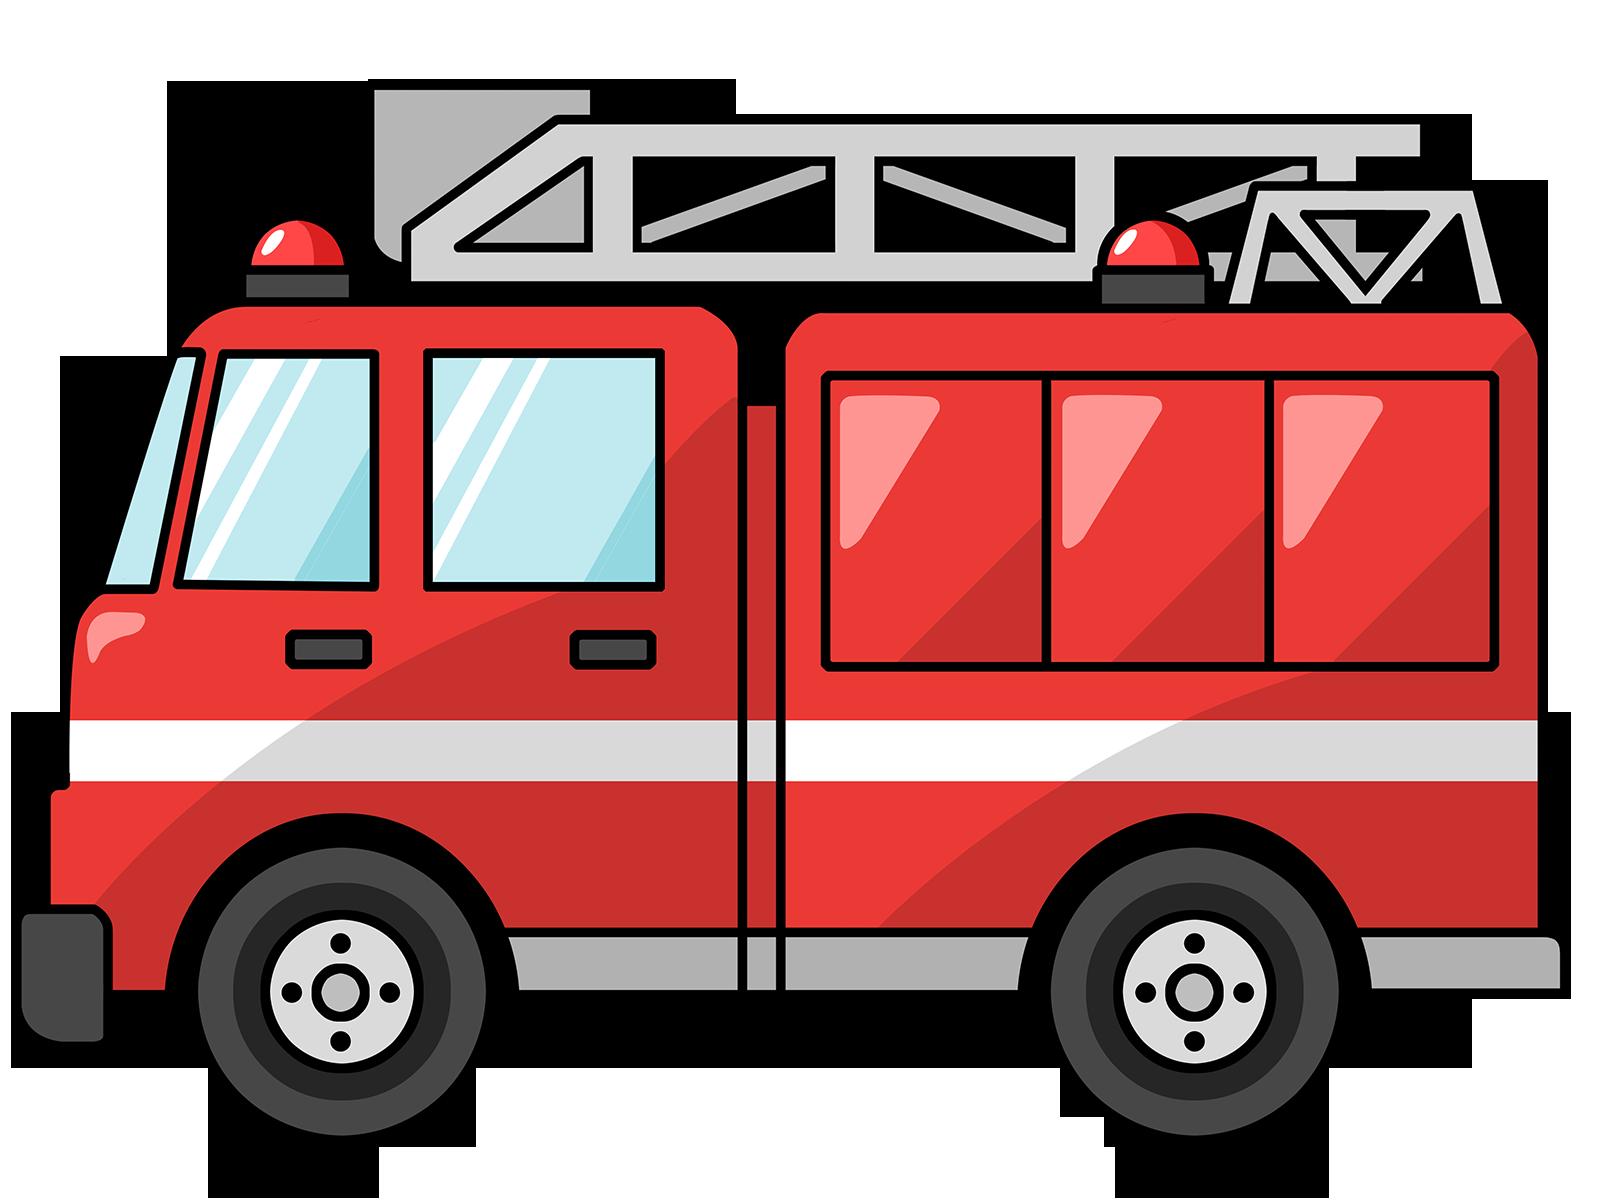 fire truck clipart google search [ 1600 x 1200 Pixel ]